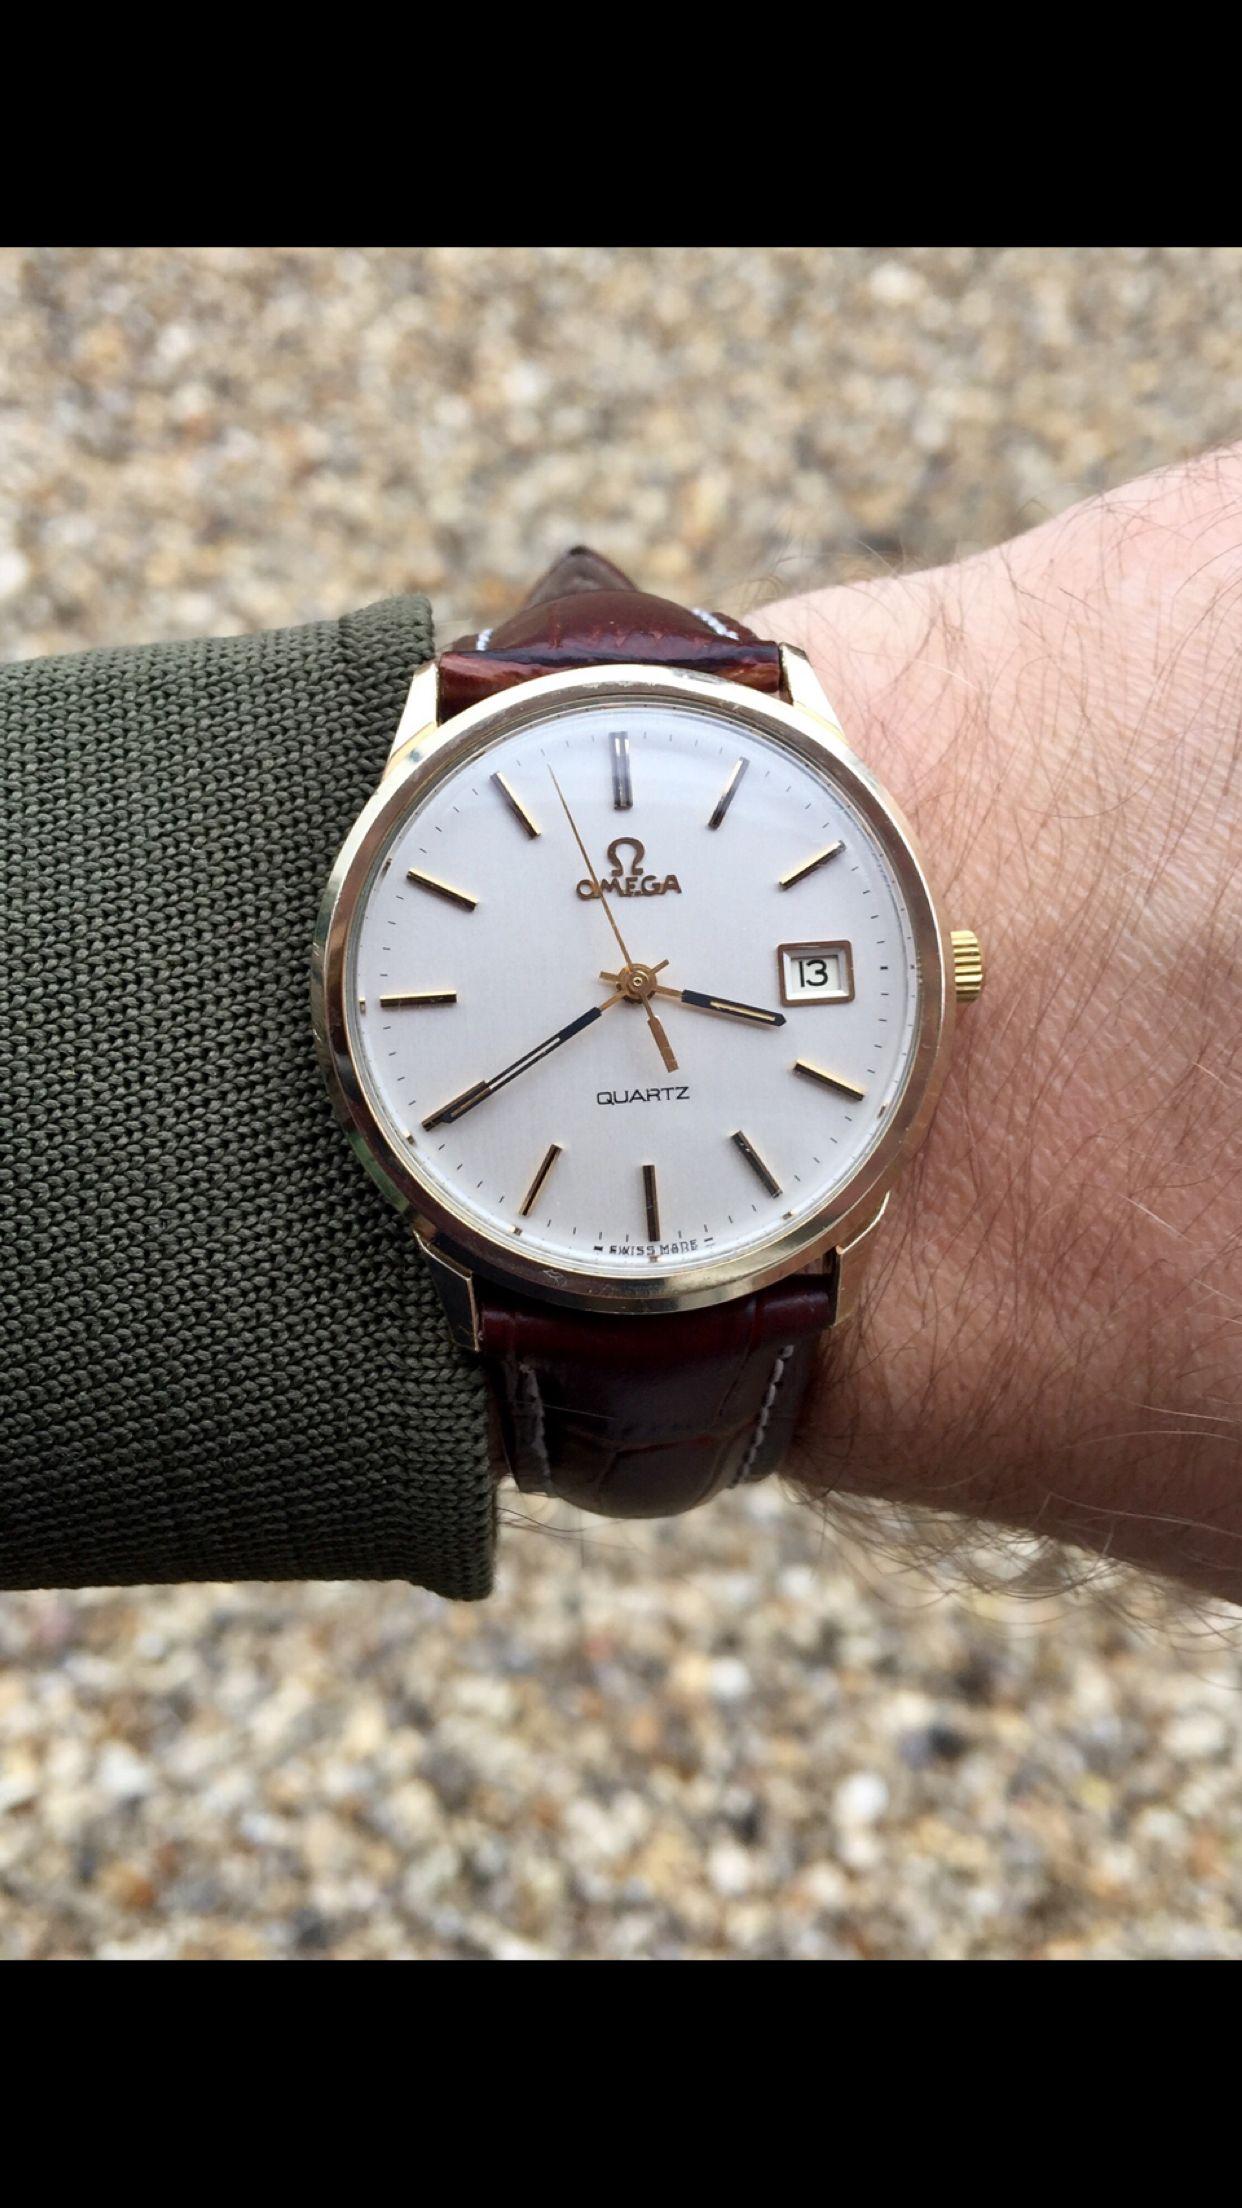 1cd44be8239 Omega Quartz Cal 1370 vintage watch 1978